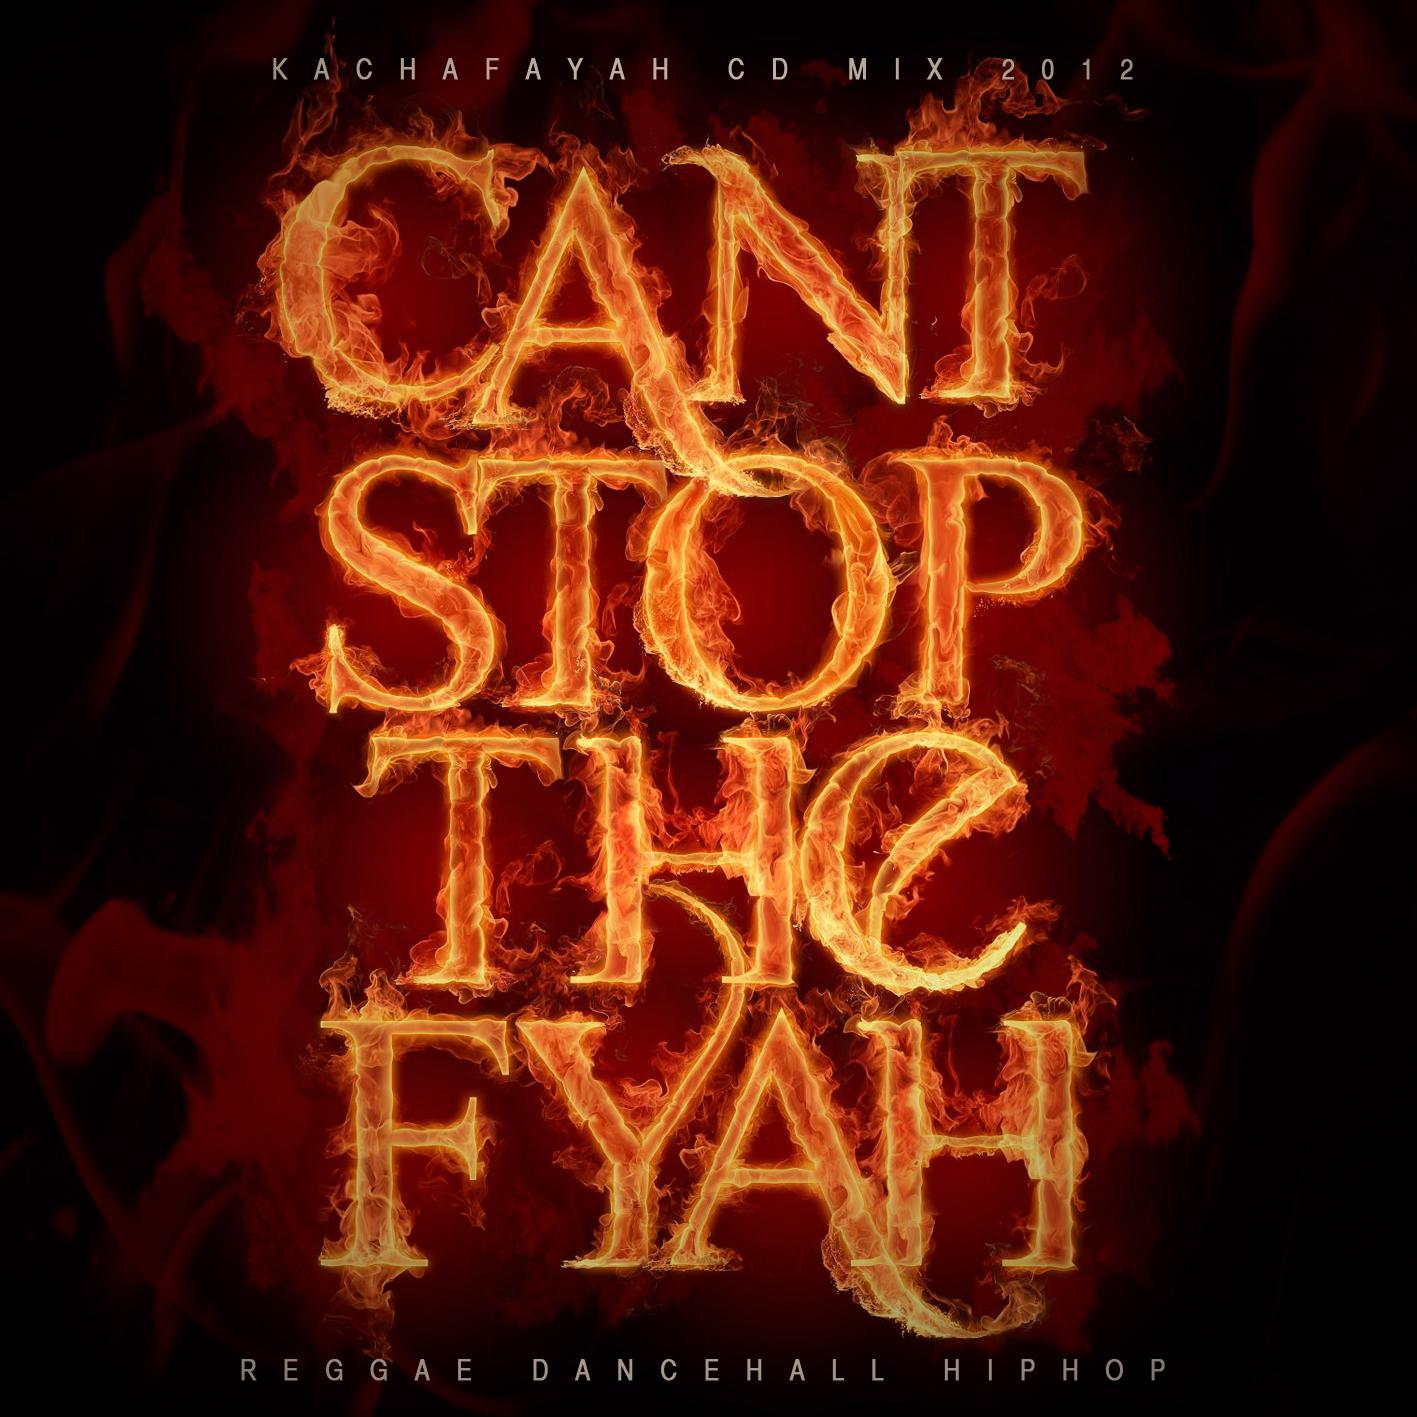 NUEVO CD MIX KACHAFAYAH CANT STOP THE FIRE 2012 Cyanstopthefire